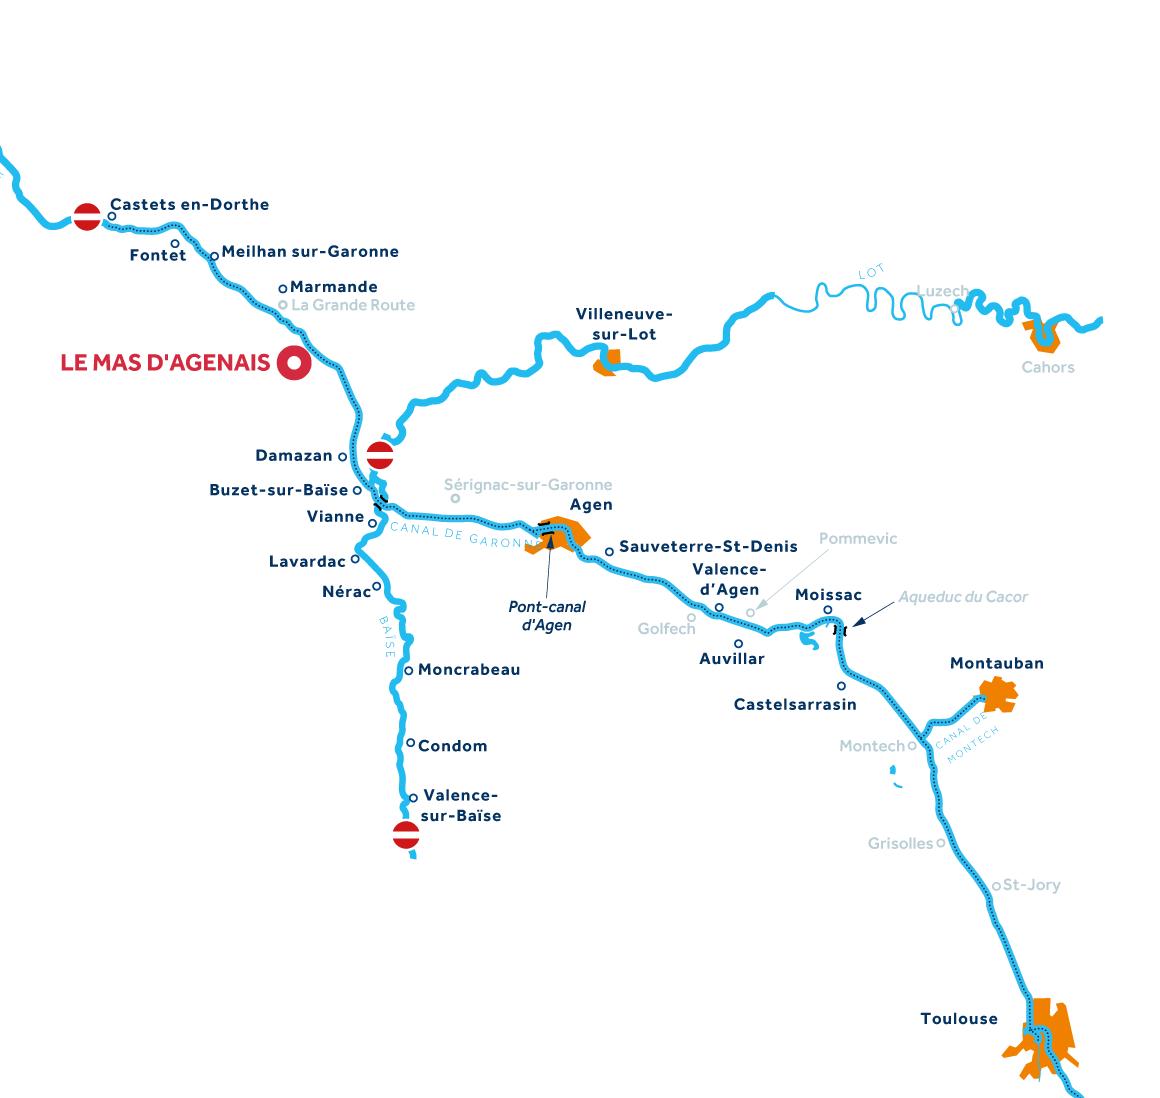 Mappa: Aquitania